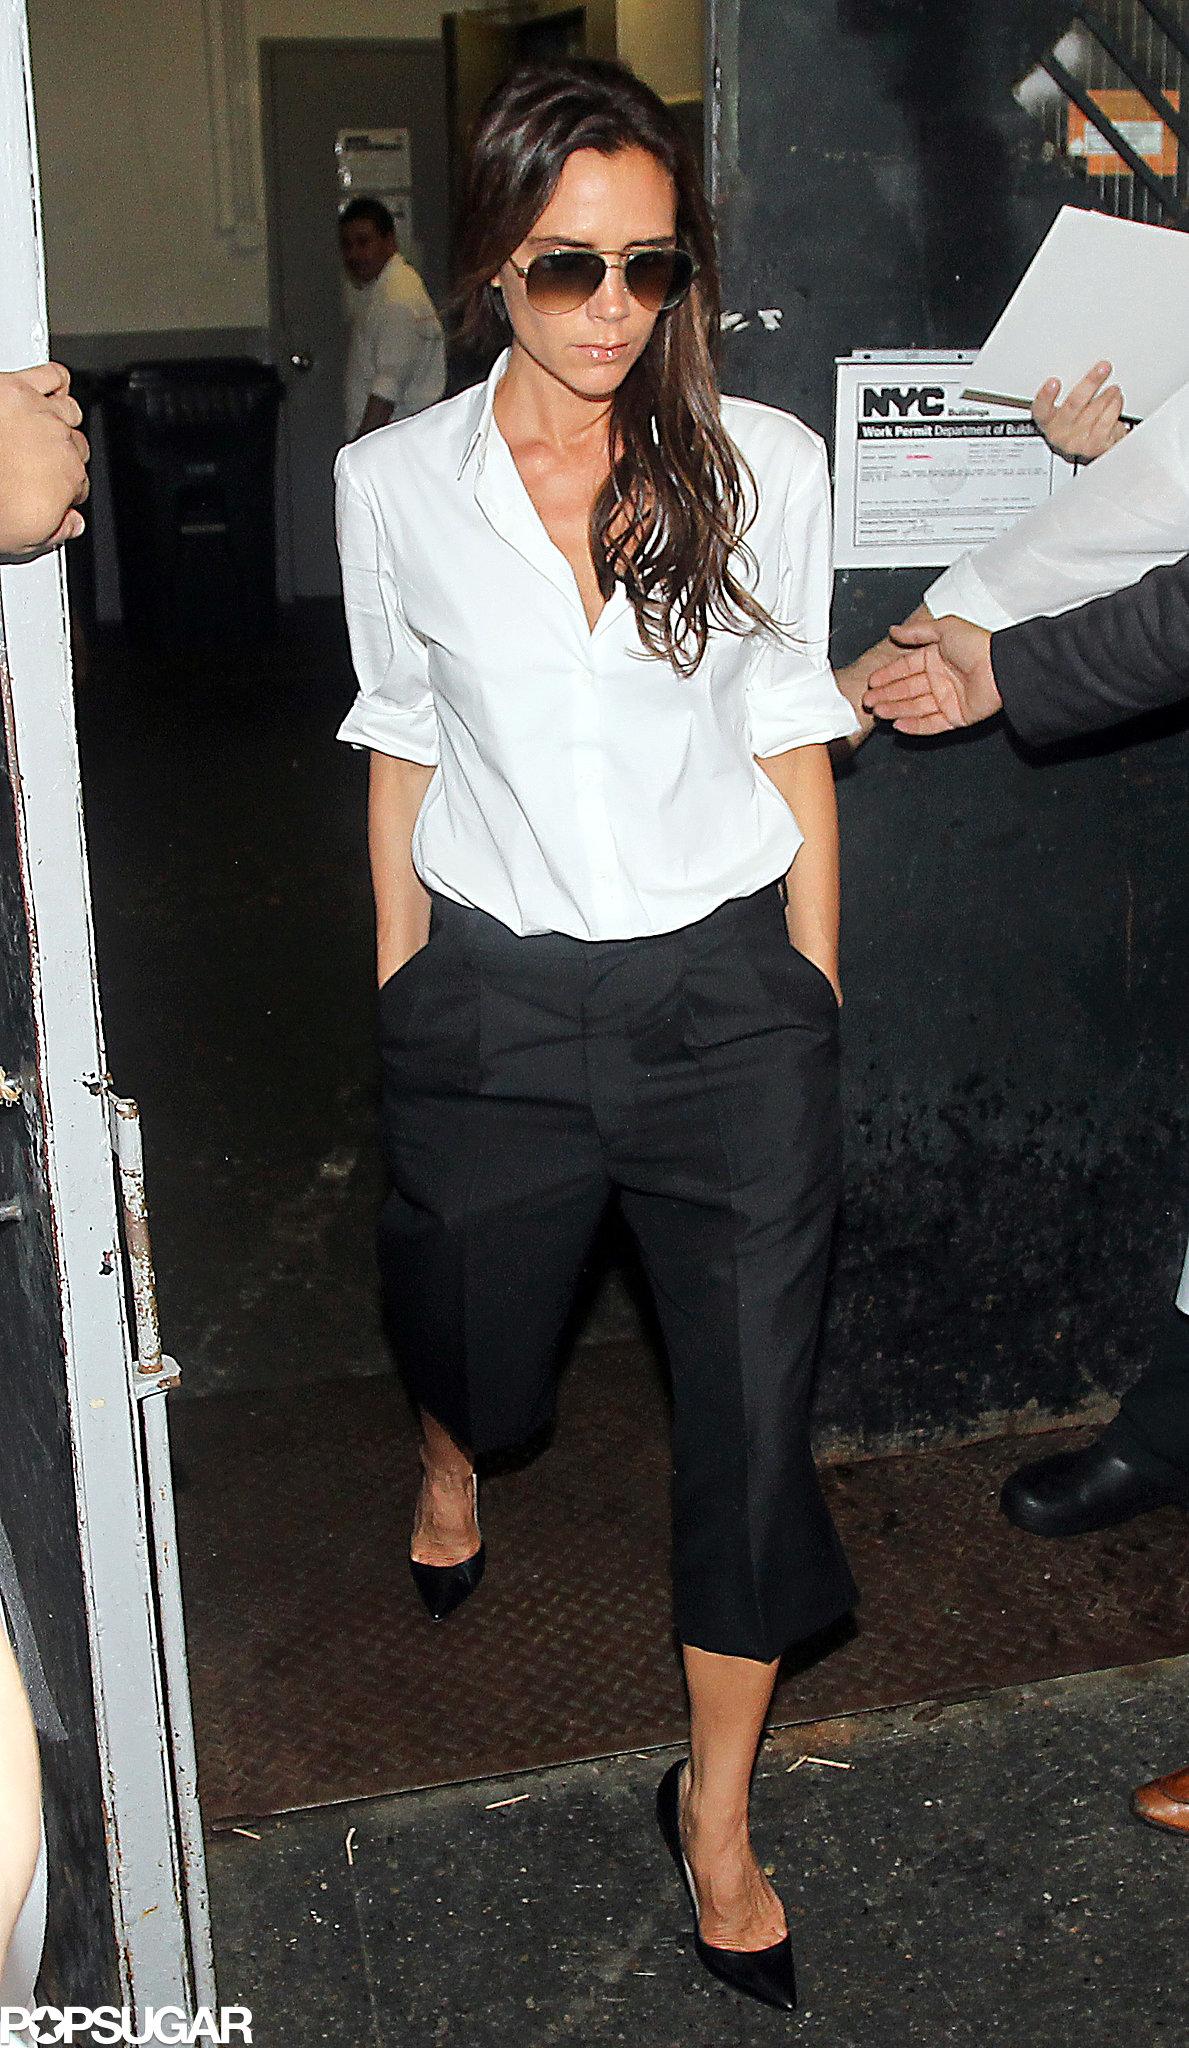 Victoria Beckham went to Balthazar after her show.